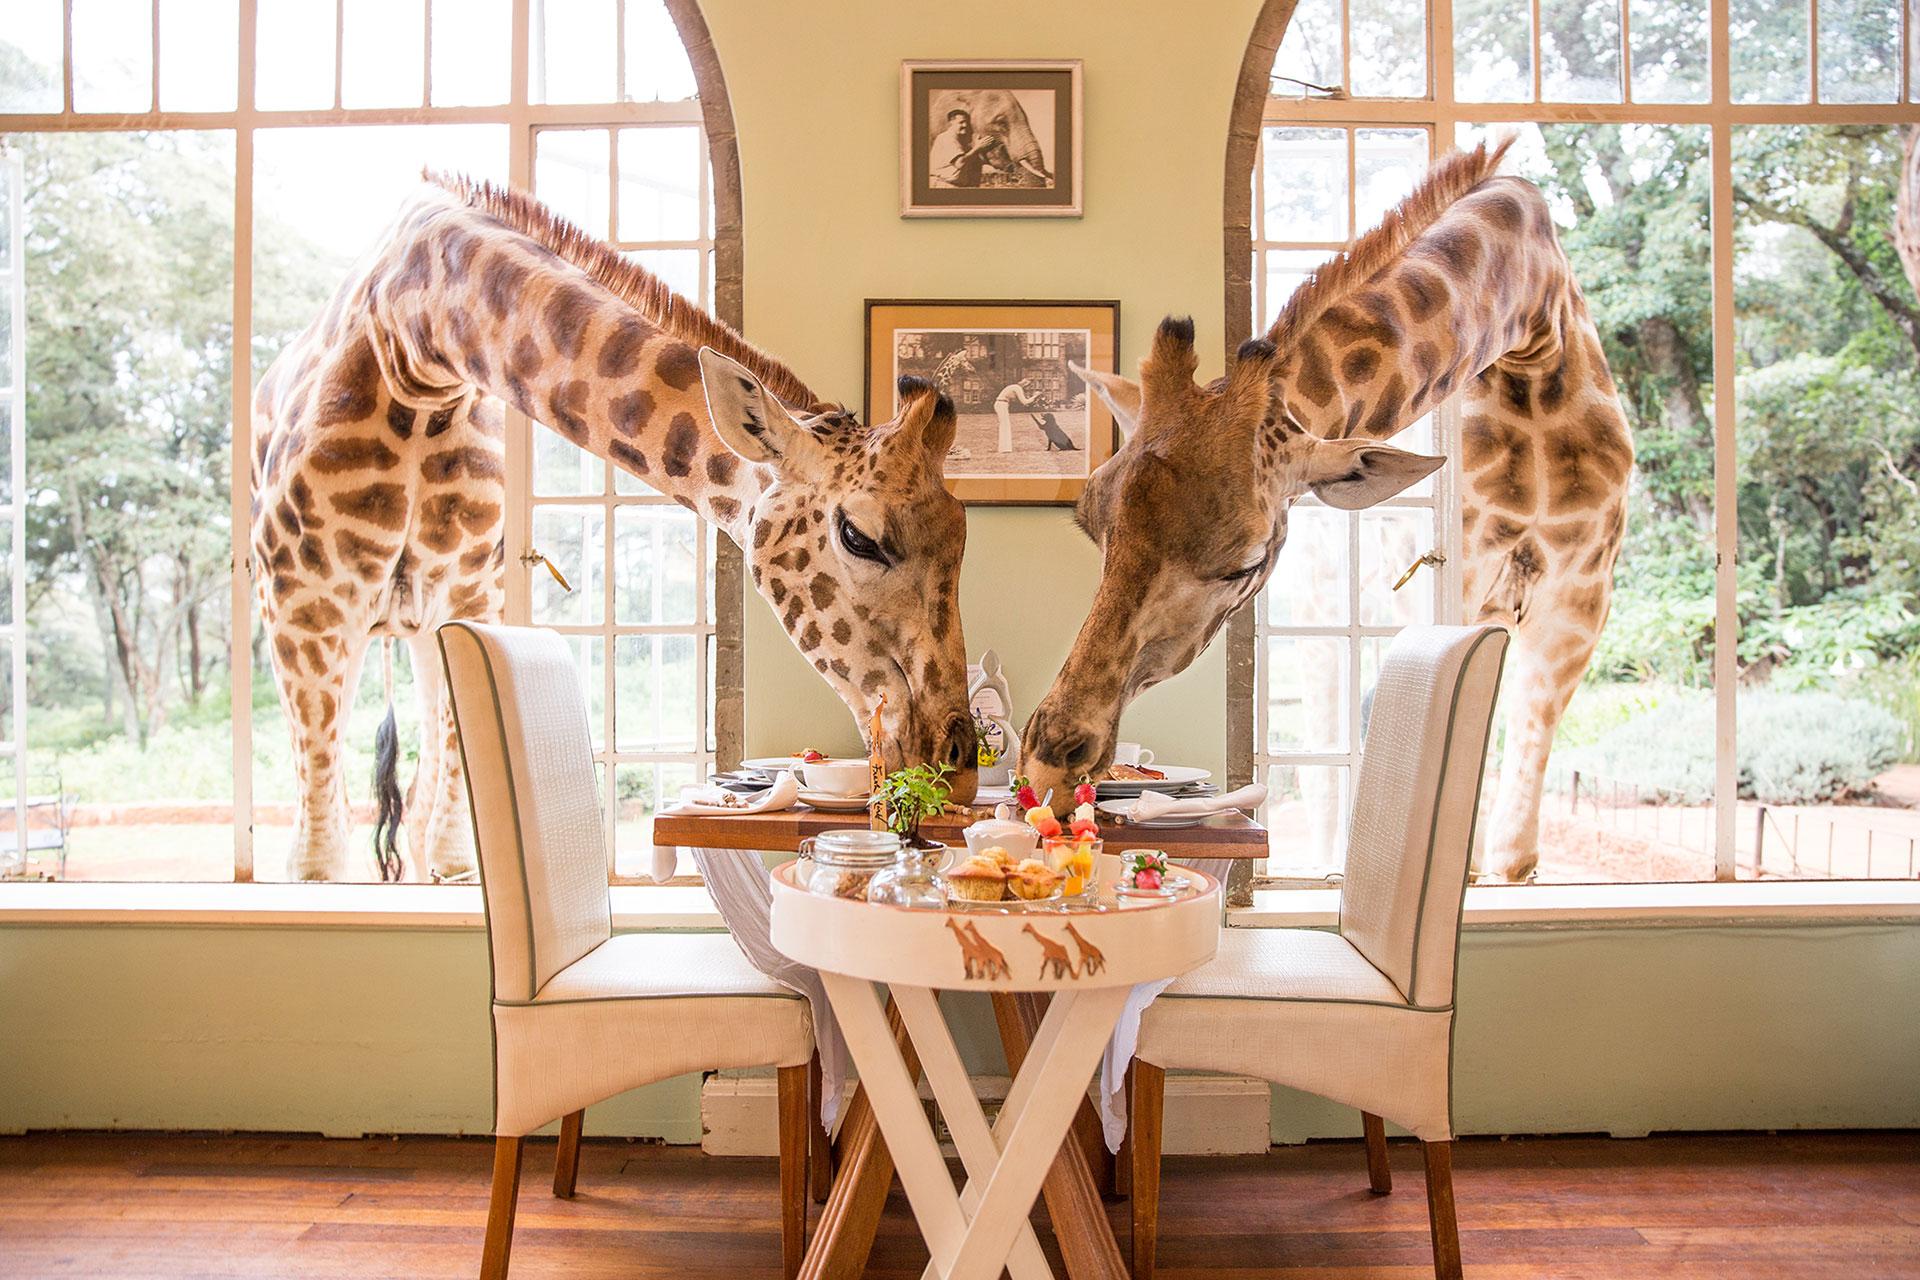 15.GIRAFFE-MANOR---Giraffe-Breakfast---giraffes-must-eat-too.jpg